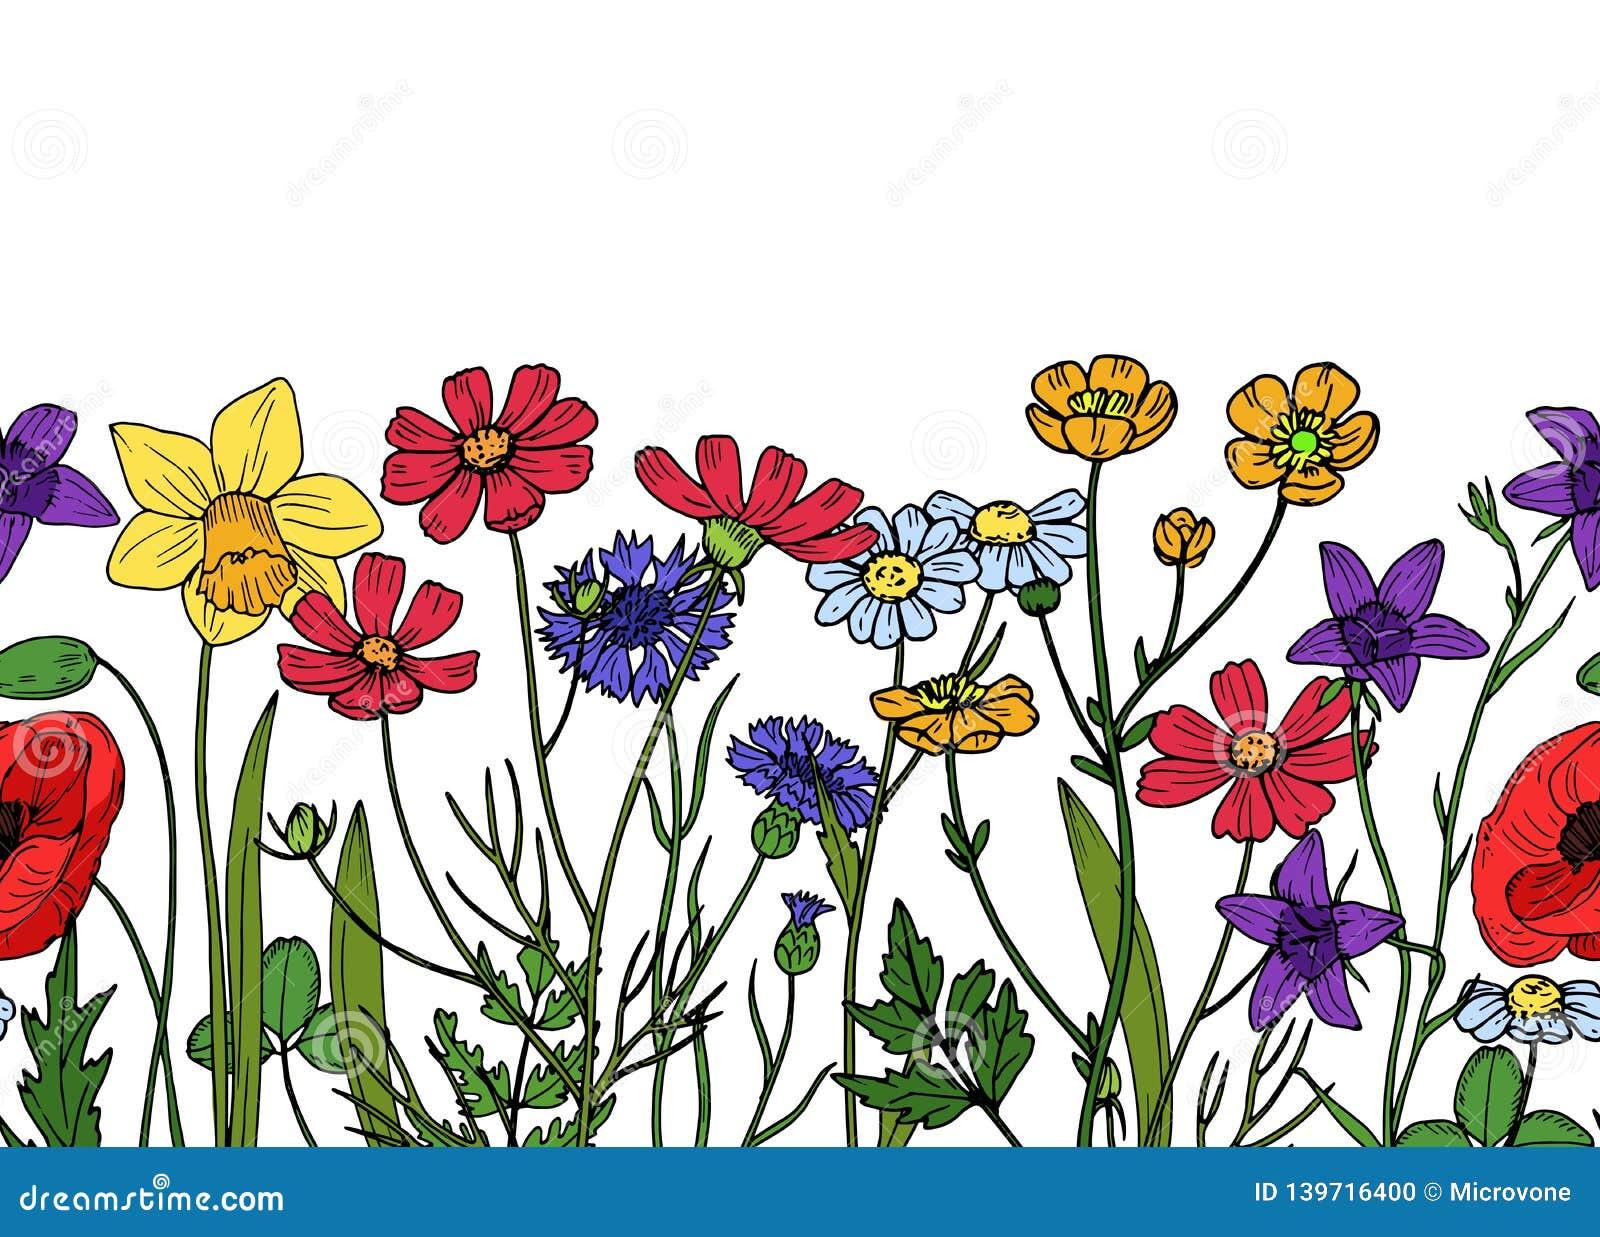 Wild Flowers Seamless Border Field Of Meadow Herb Floral Vintage